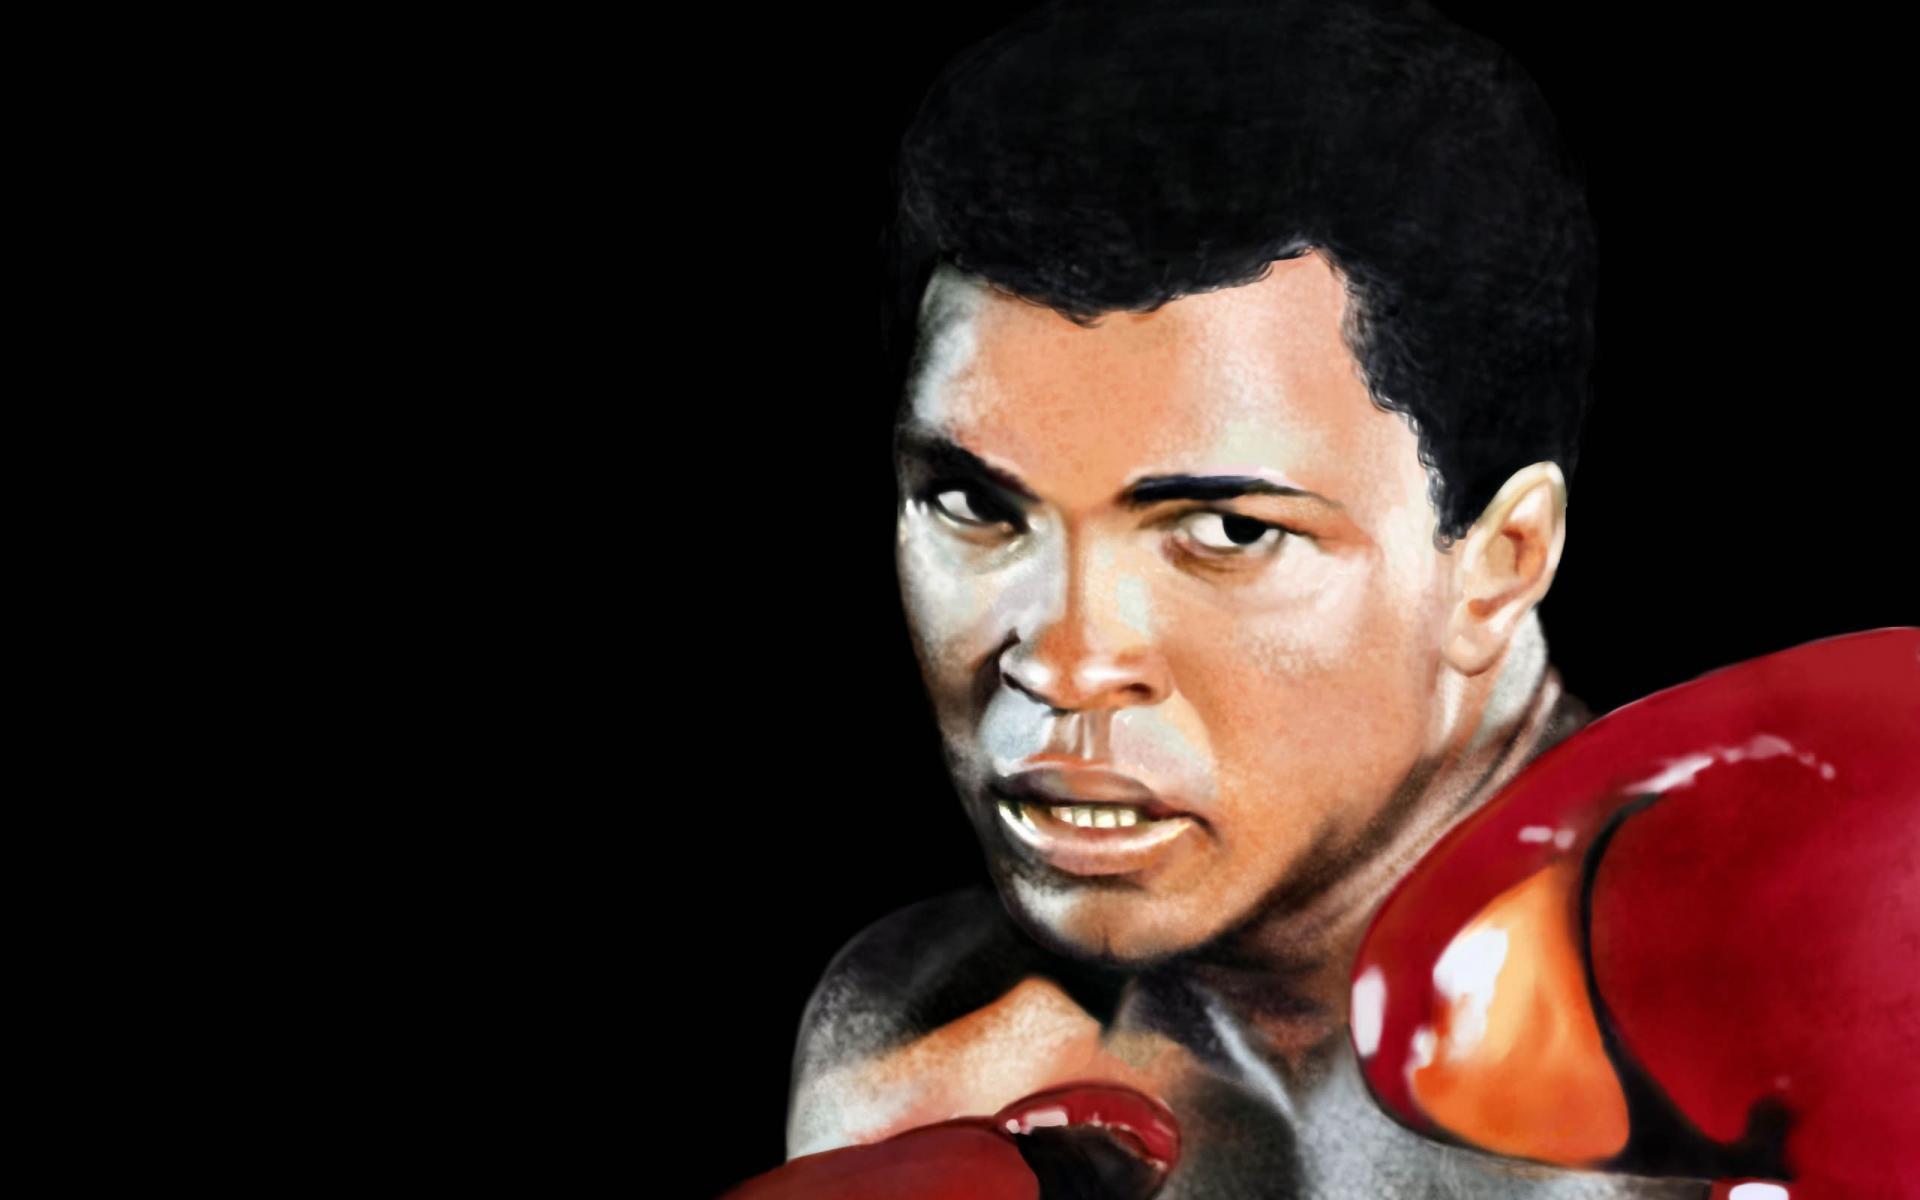 Muhammad Ali Full HD Desktop Wallpapers 1080p 1920x1200